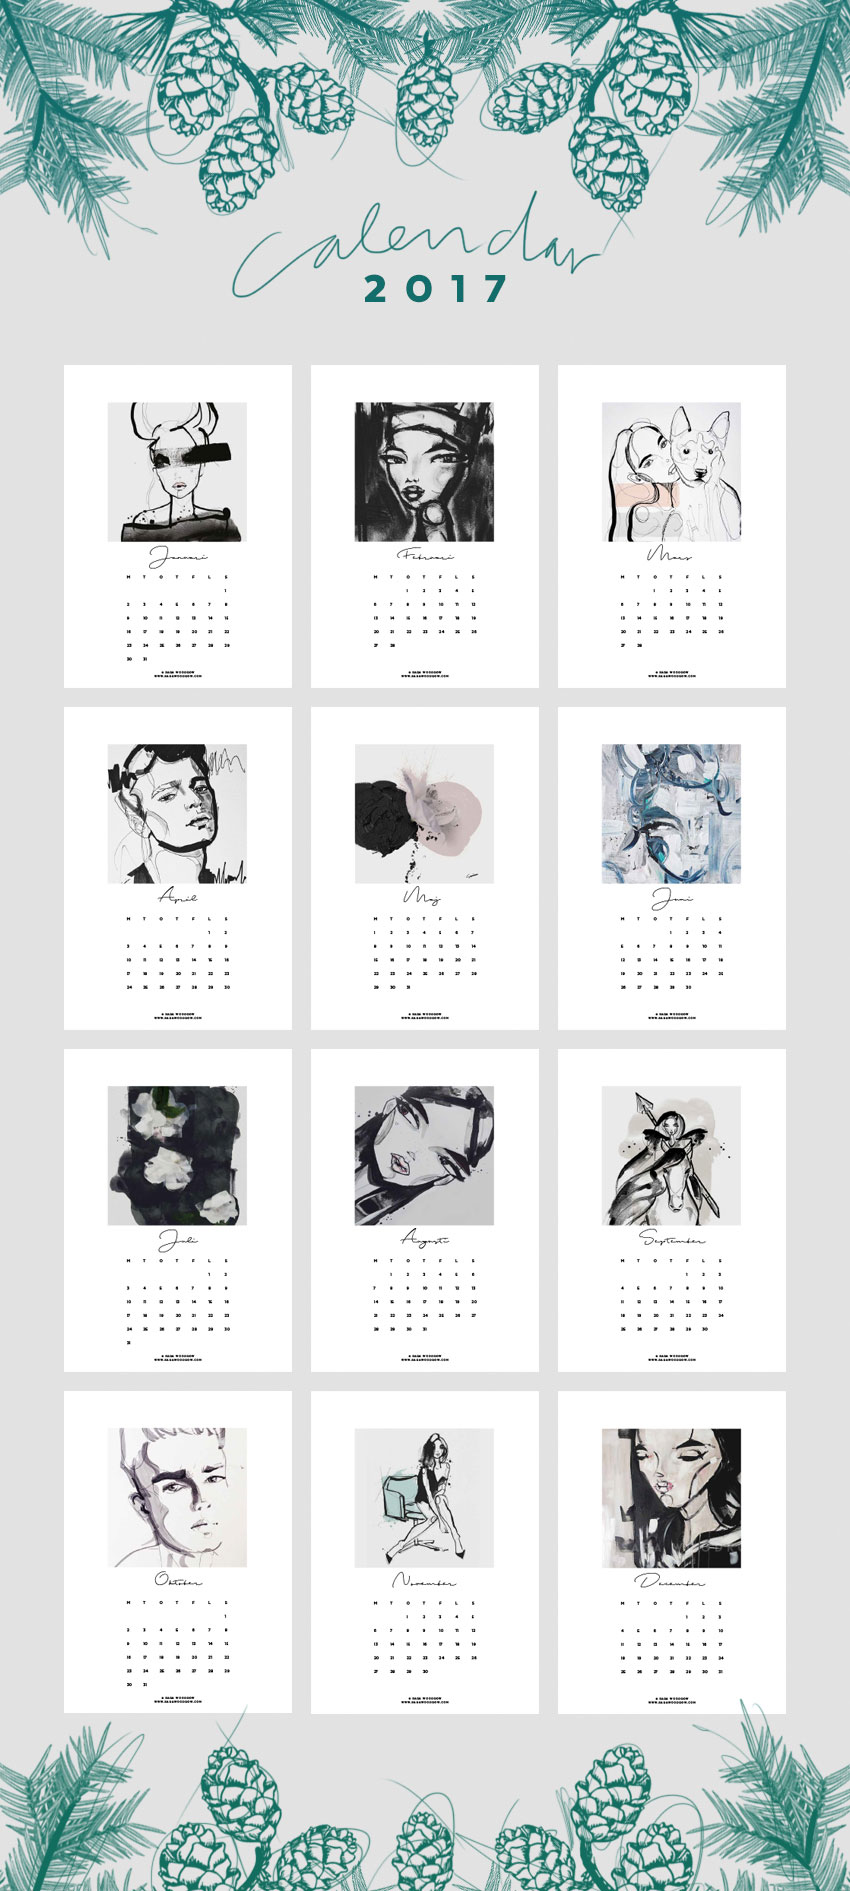 calendar_2017_sara_woodrow_02